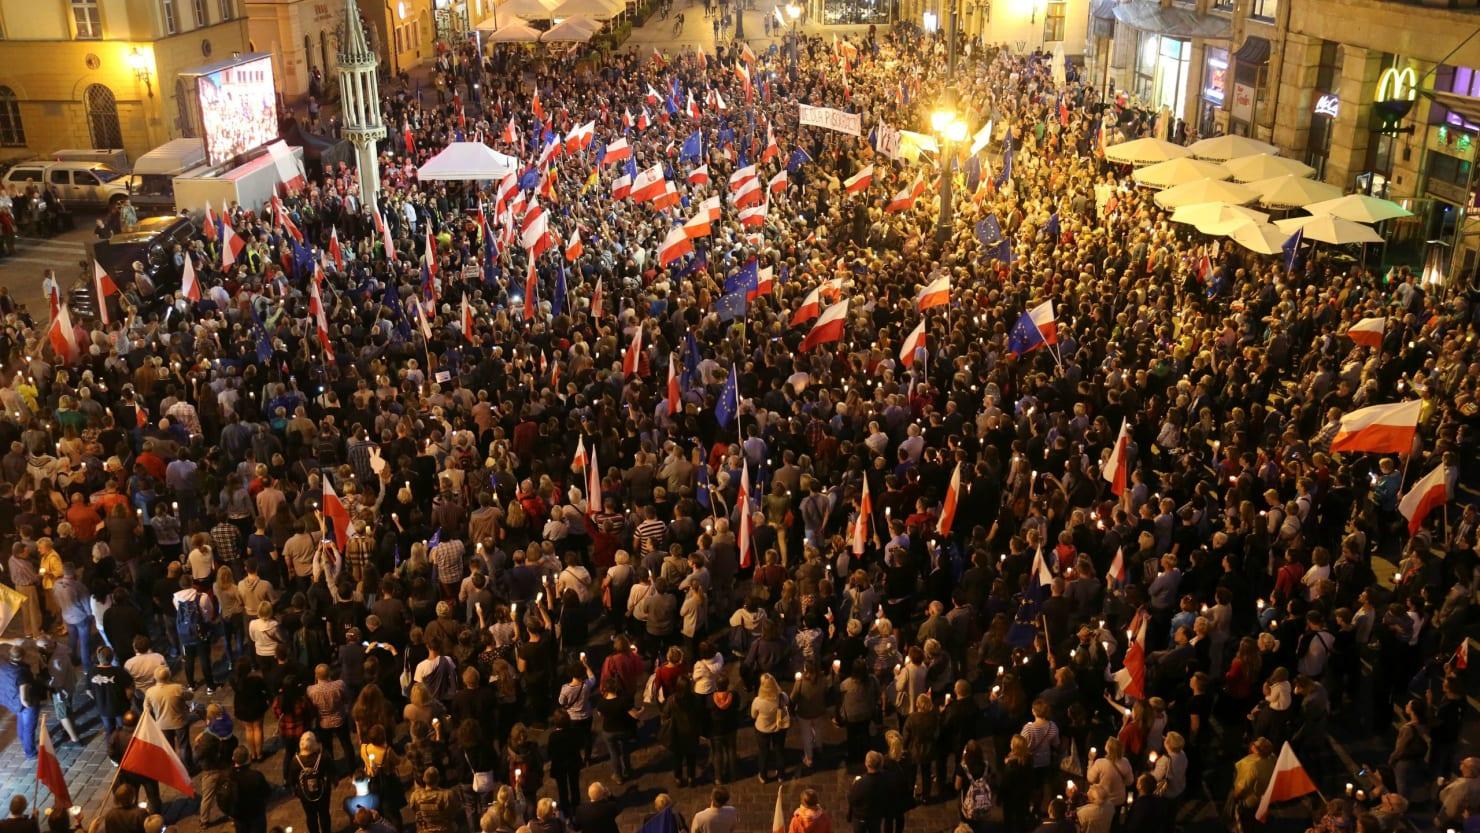 Poland challenged on court reform